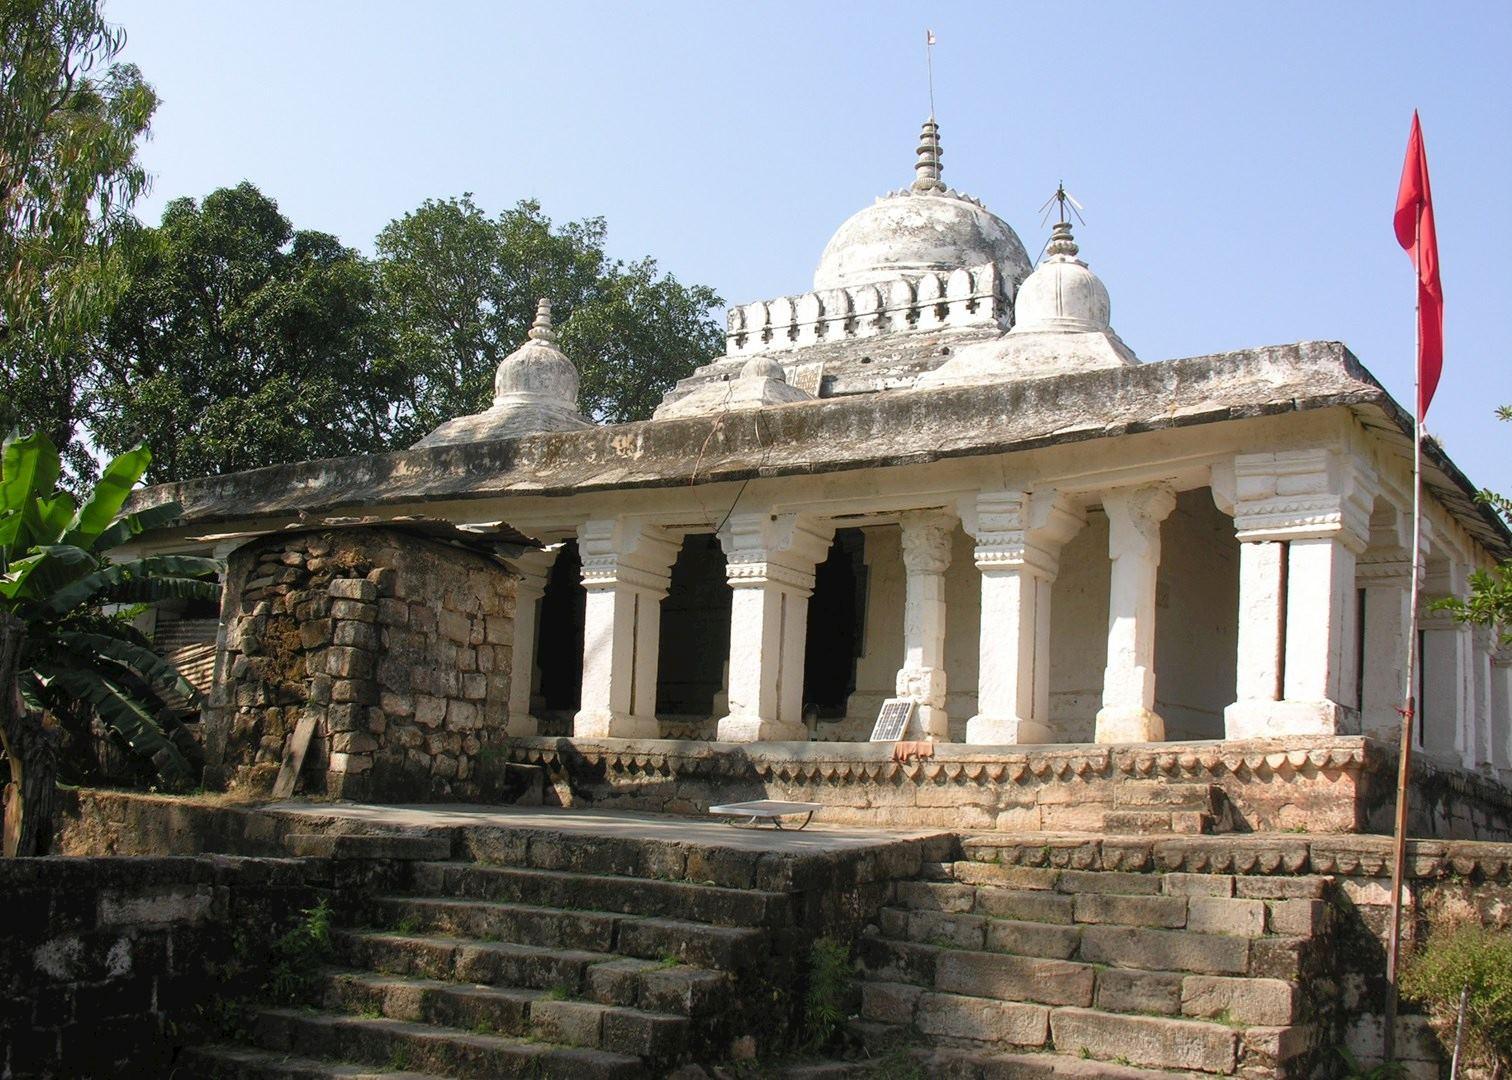 Bandhavgarh India  city pictures gallery : Bandhavgarh Fort, Bandhavgarh National Park, India